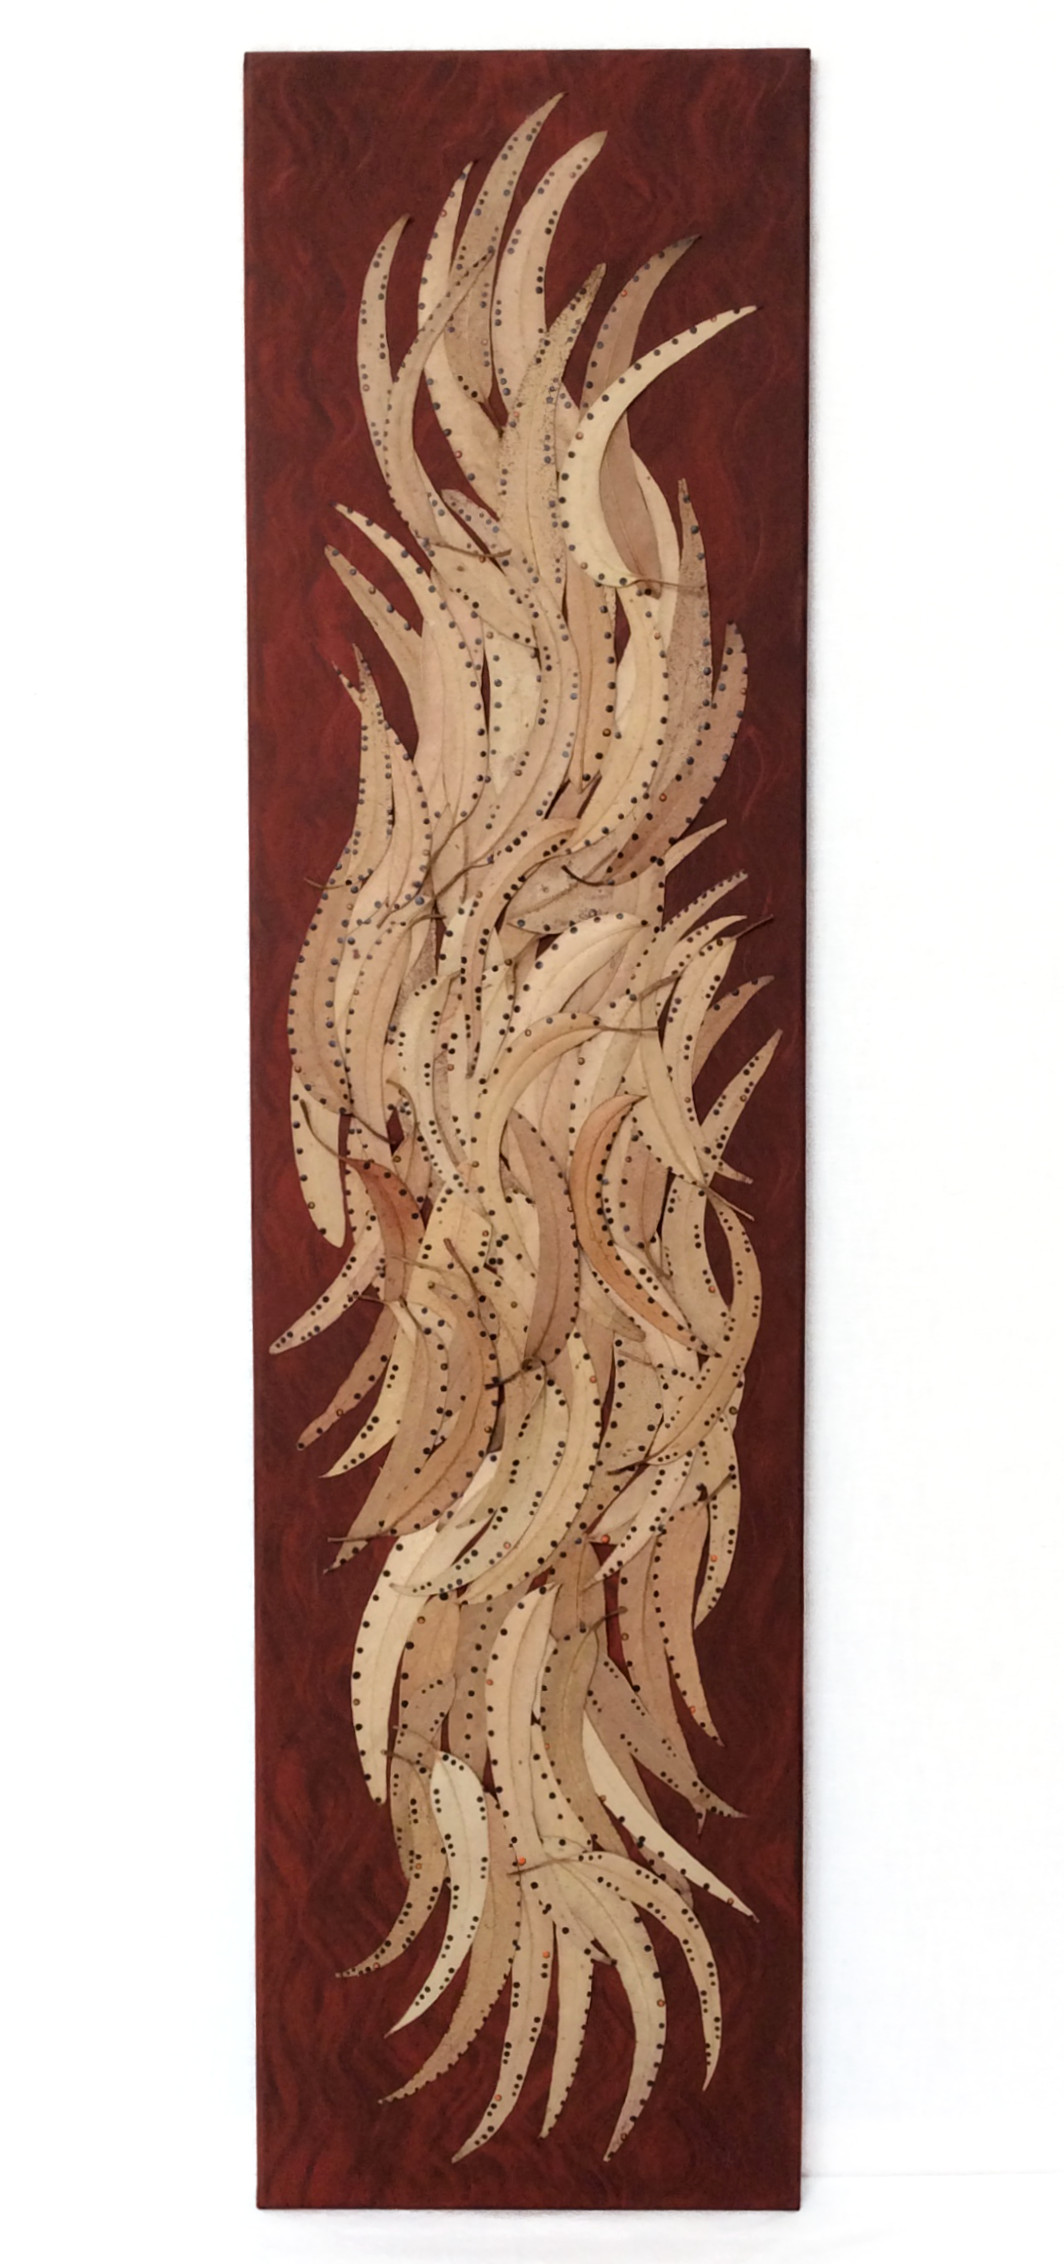 Bild 1,20 x 0,30 m Eukalyptusblätter (2018)